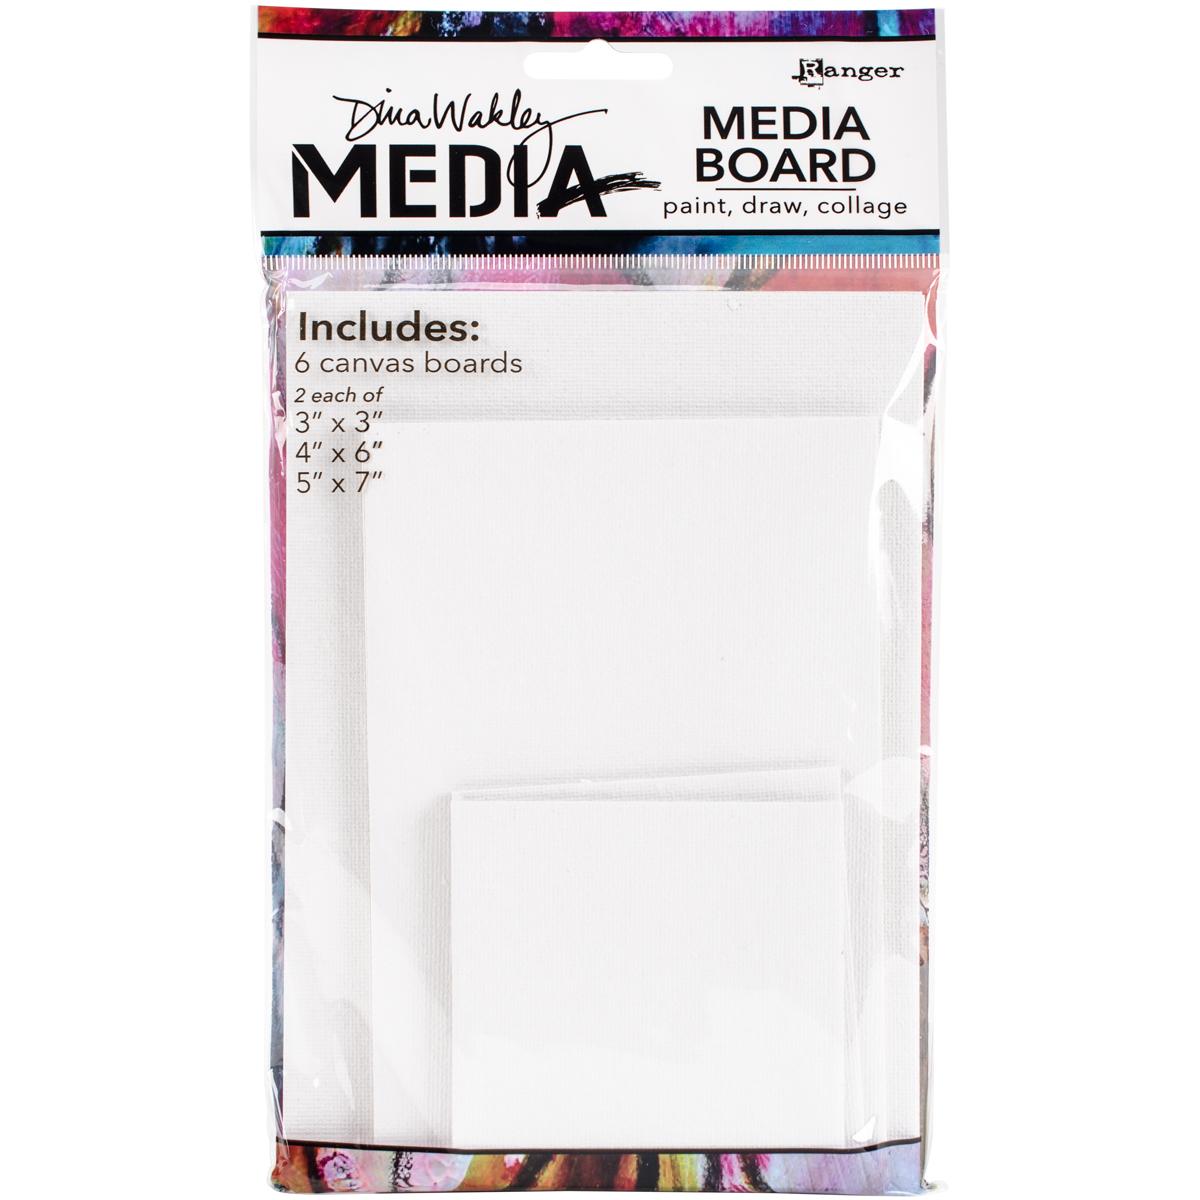 Dina Wakley Media Board Mixed Pack (Includes 2- 3 x 3 Panels 2- 4 x 6 Panels 2- 5 x 7 Panels)